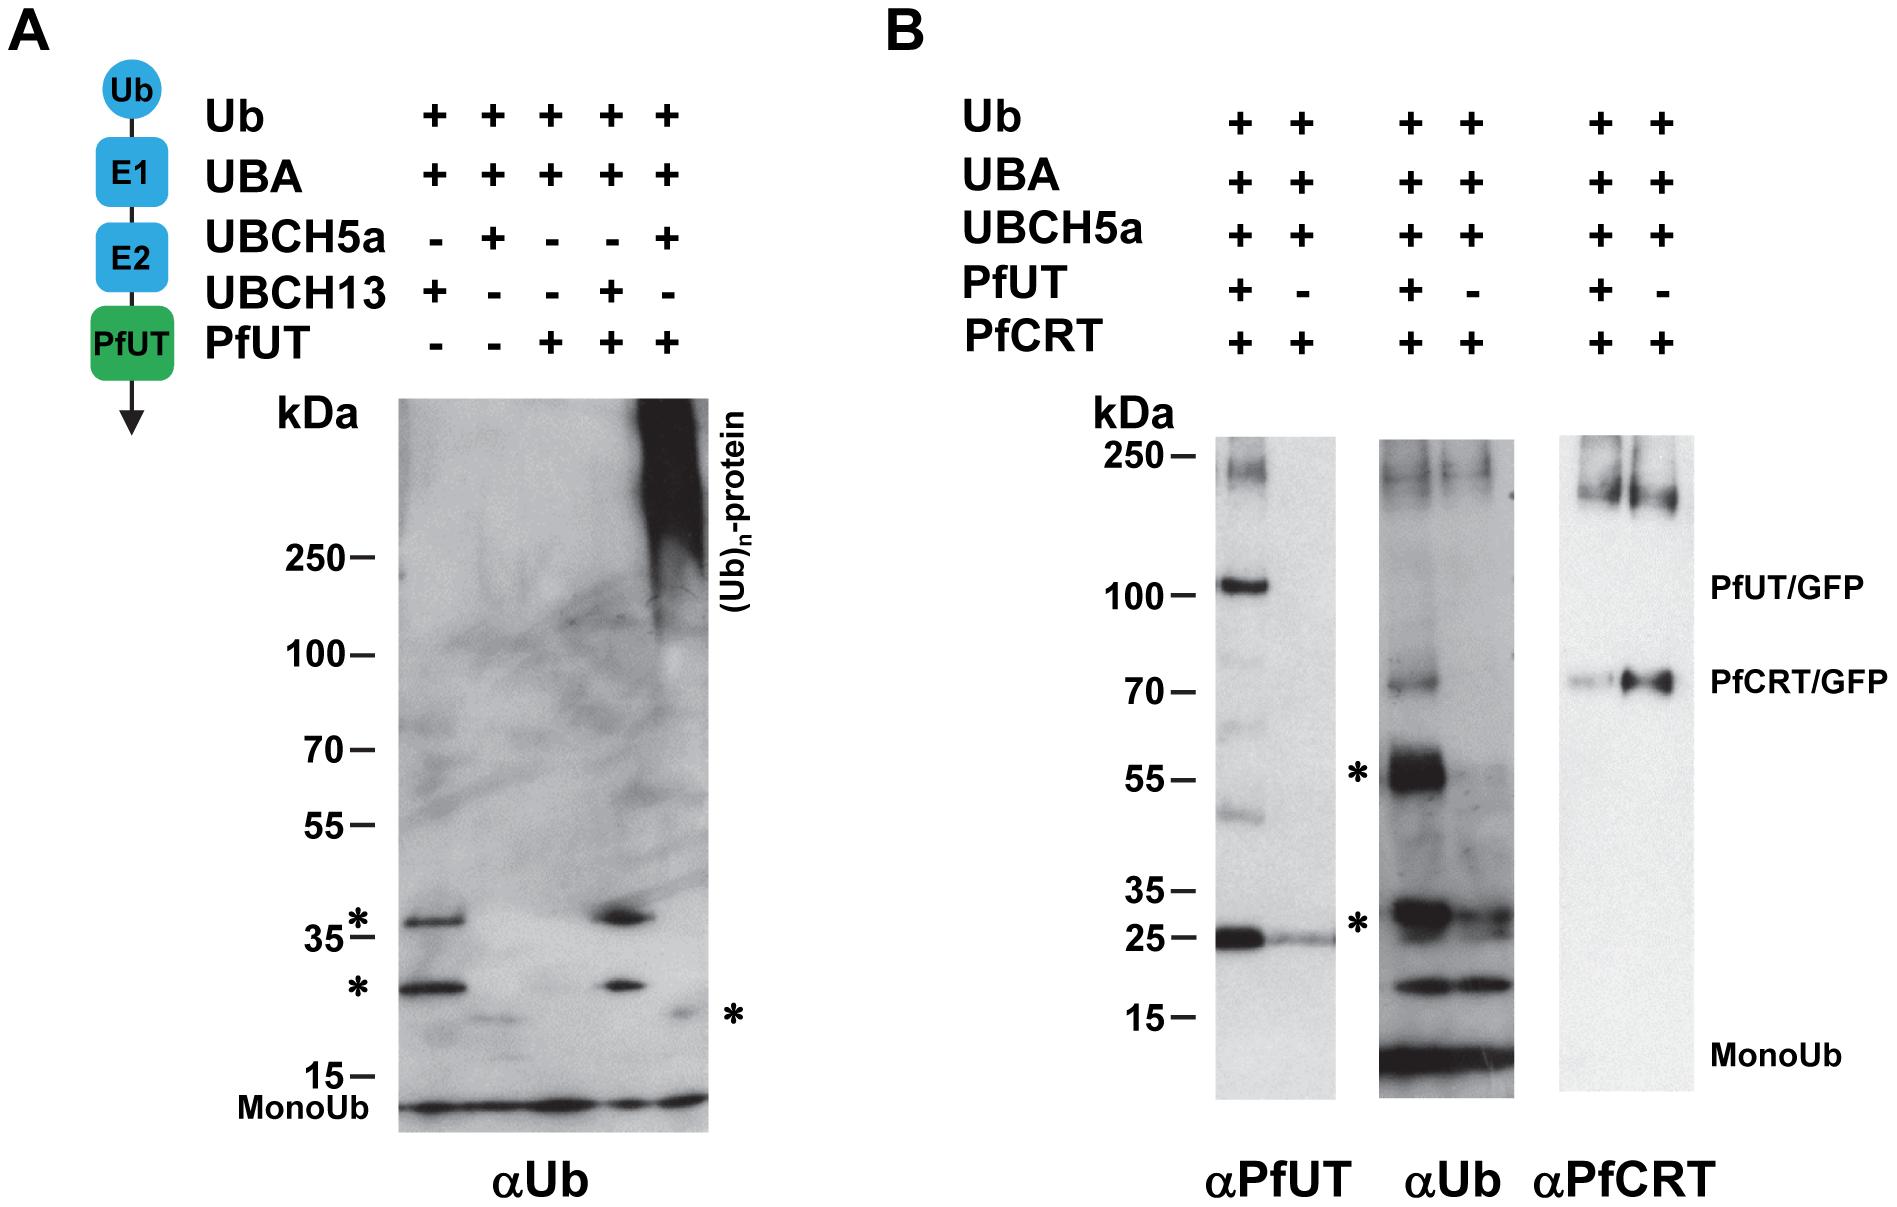 Biochemical characterization of the PfUT HECT domain.